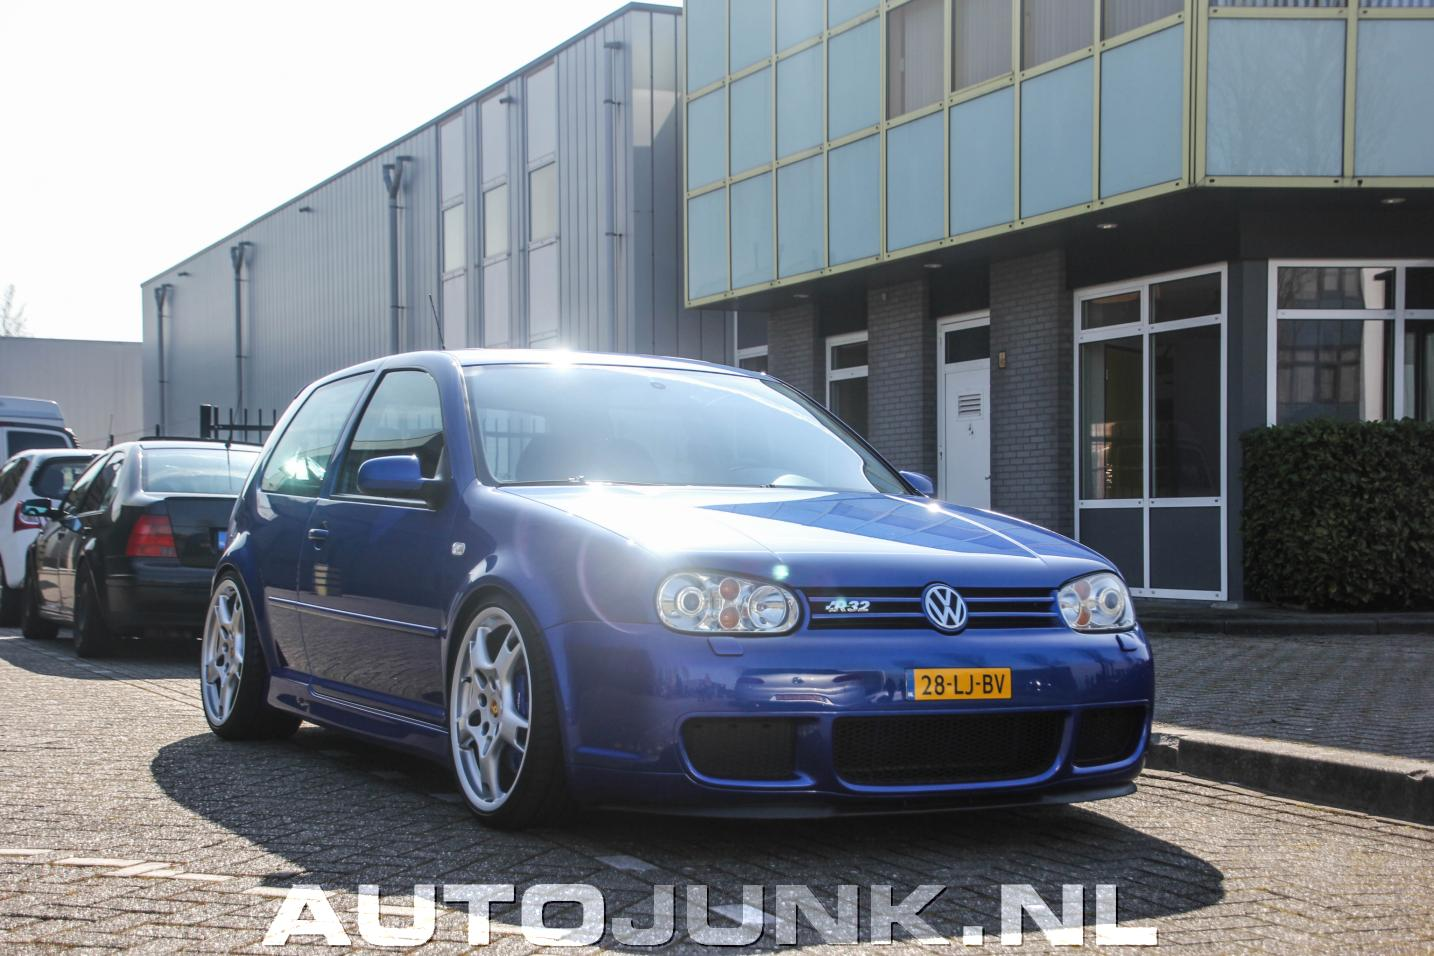 Volkswagen Golf 4 Velgen Rsd19 Tlyp